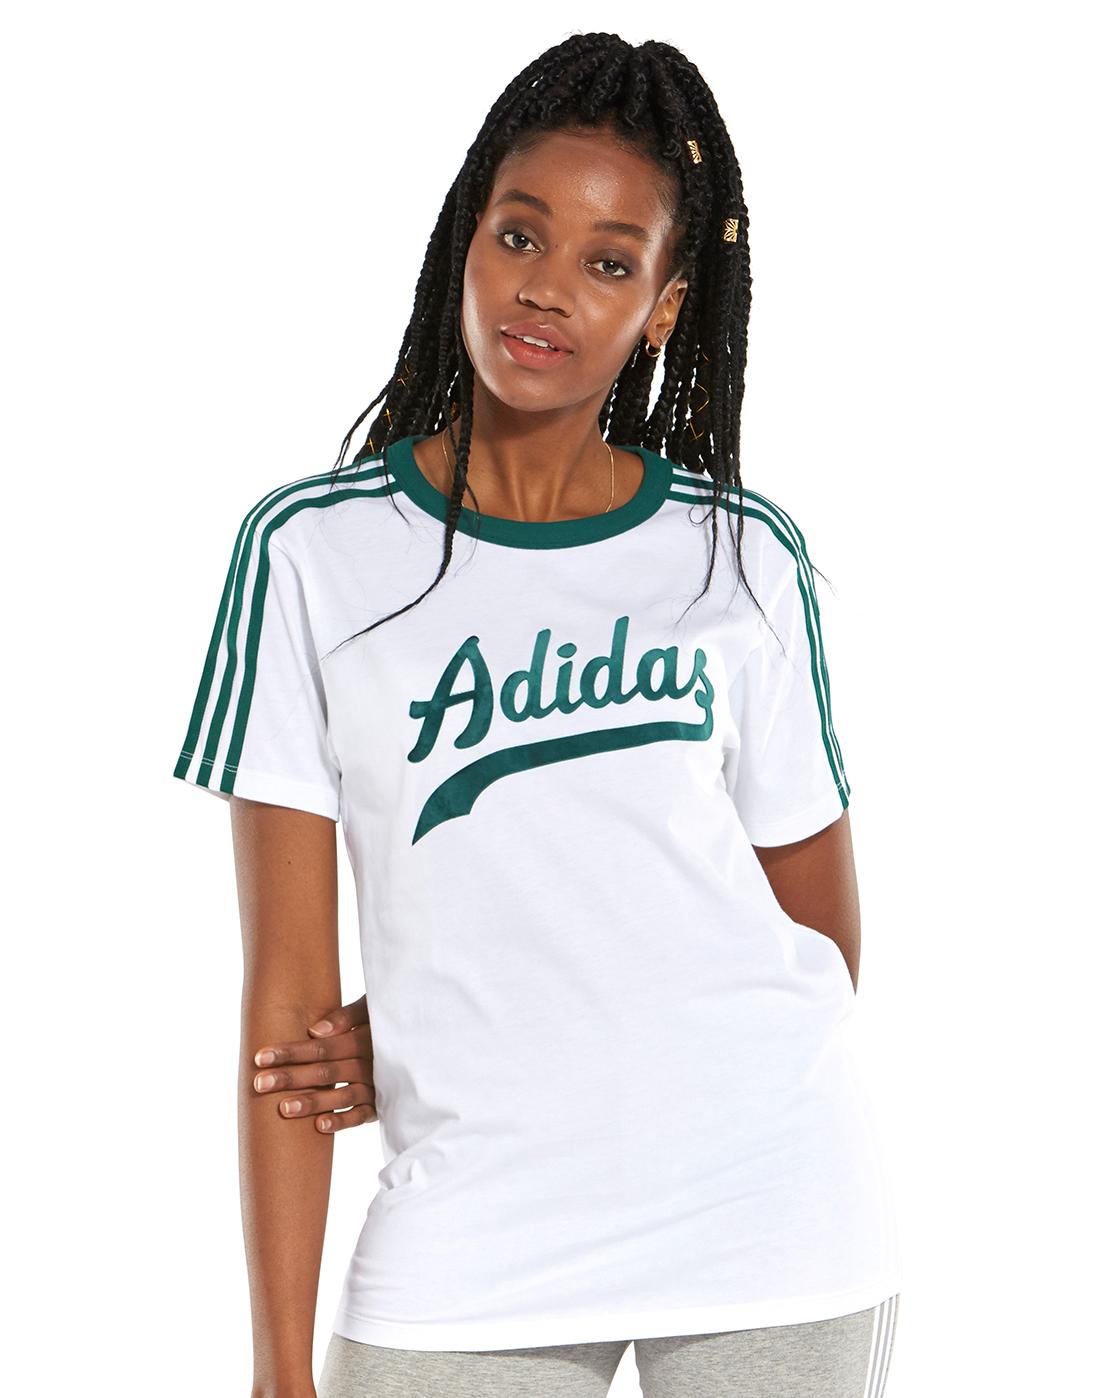 Women's White & Green adidas Originals T-Shirt | Life Style Sports